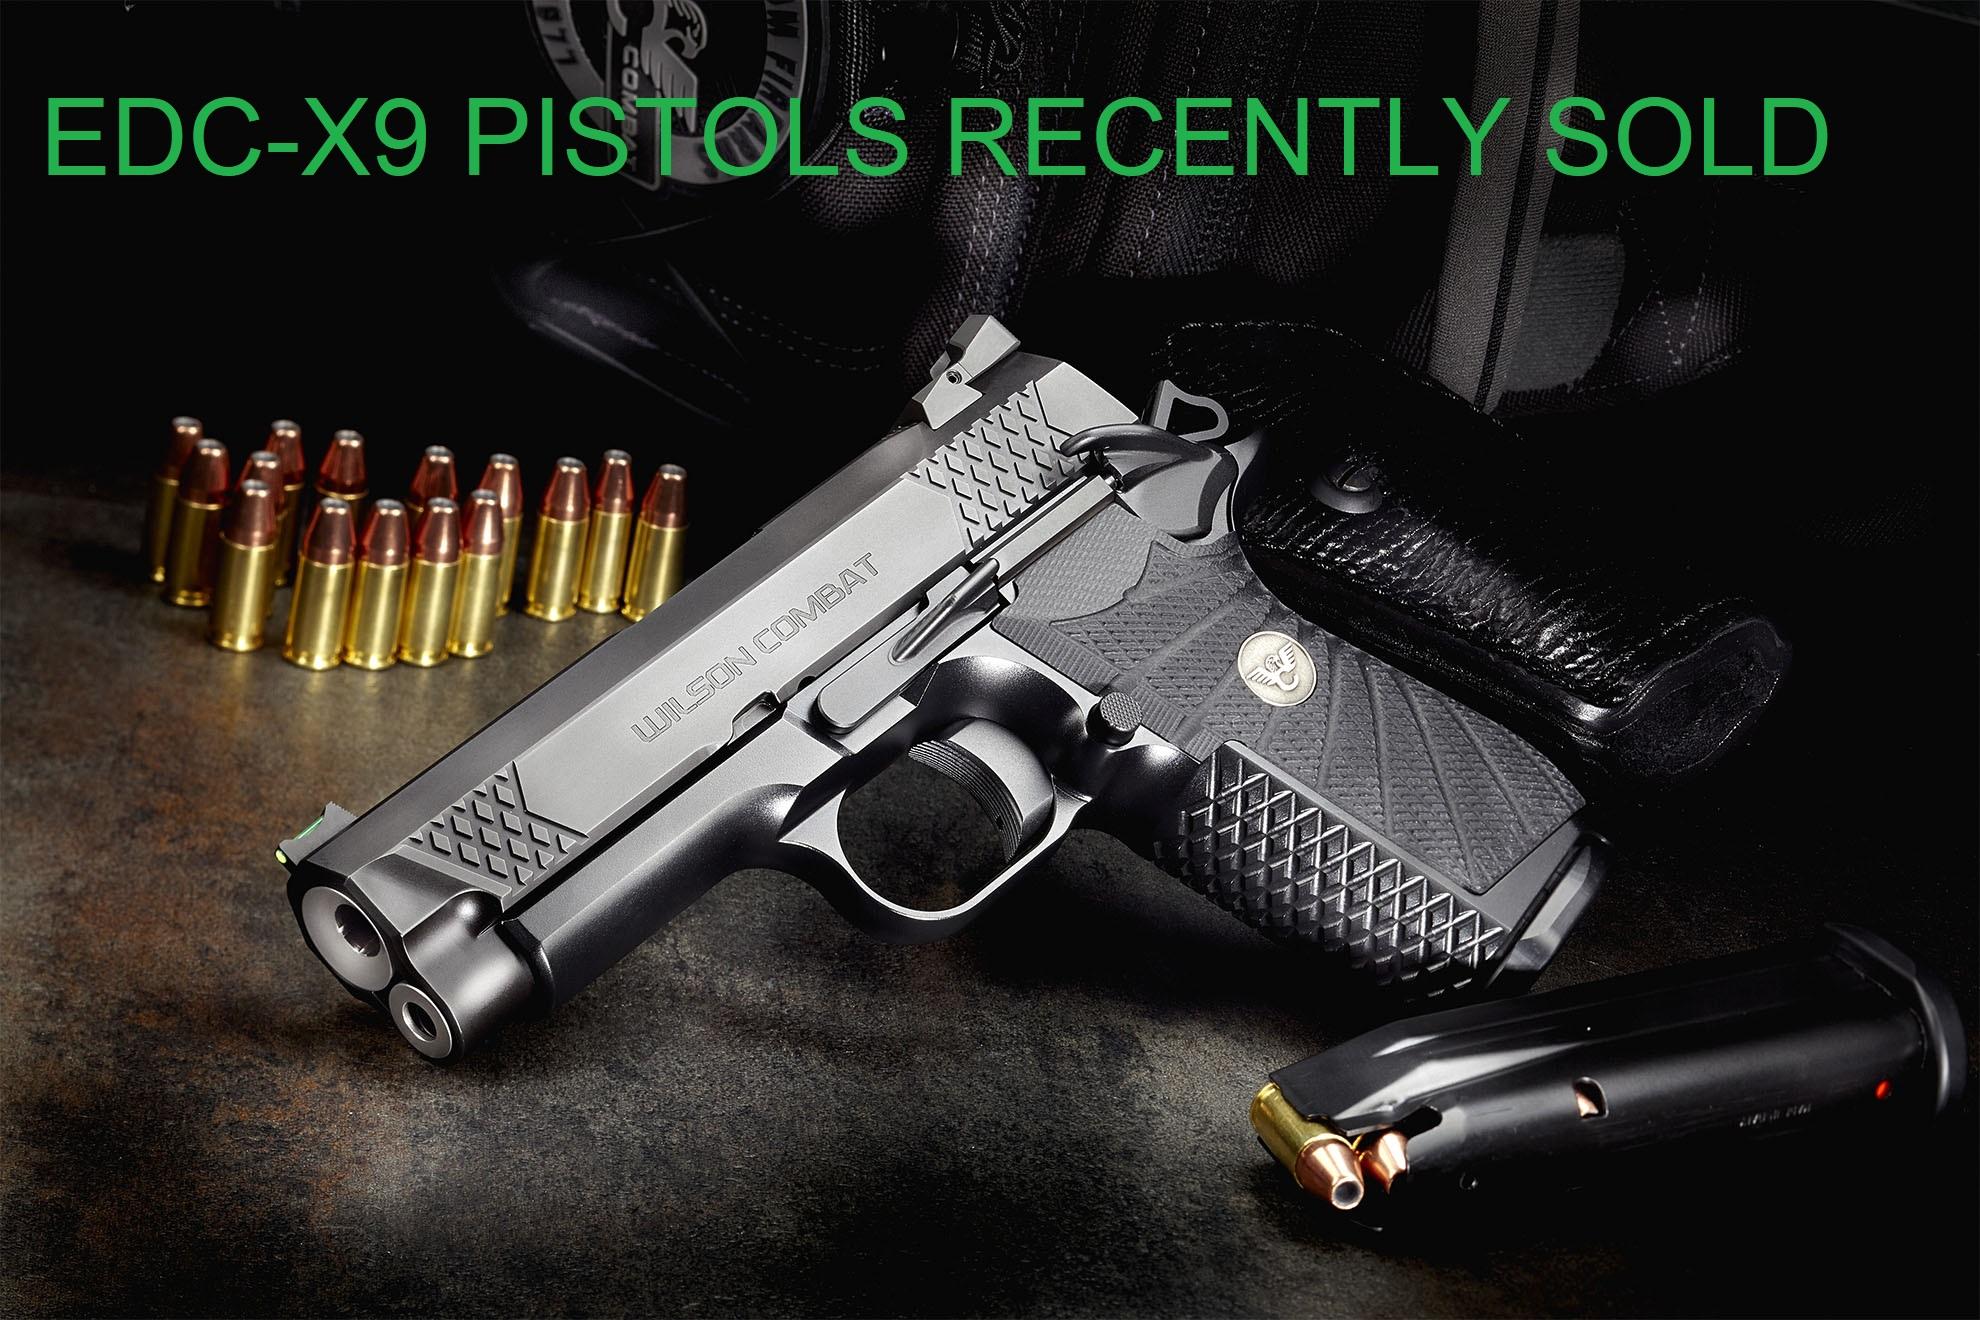 Wilson Combat EDC-X9 Pistols Previously Sold